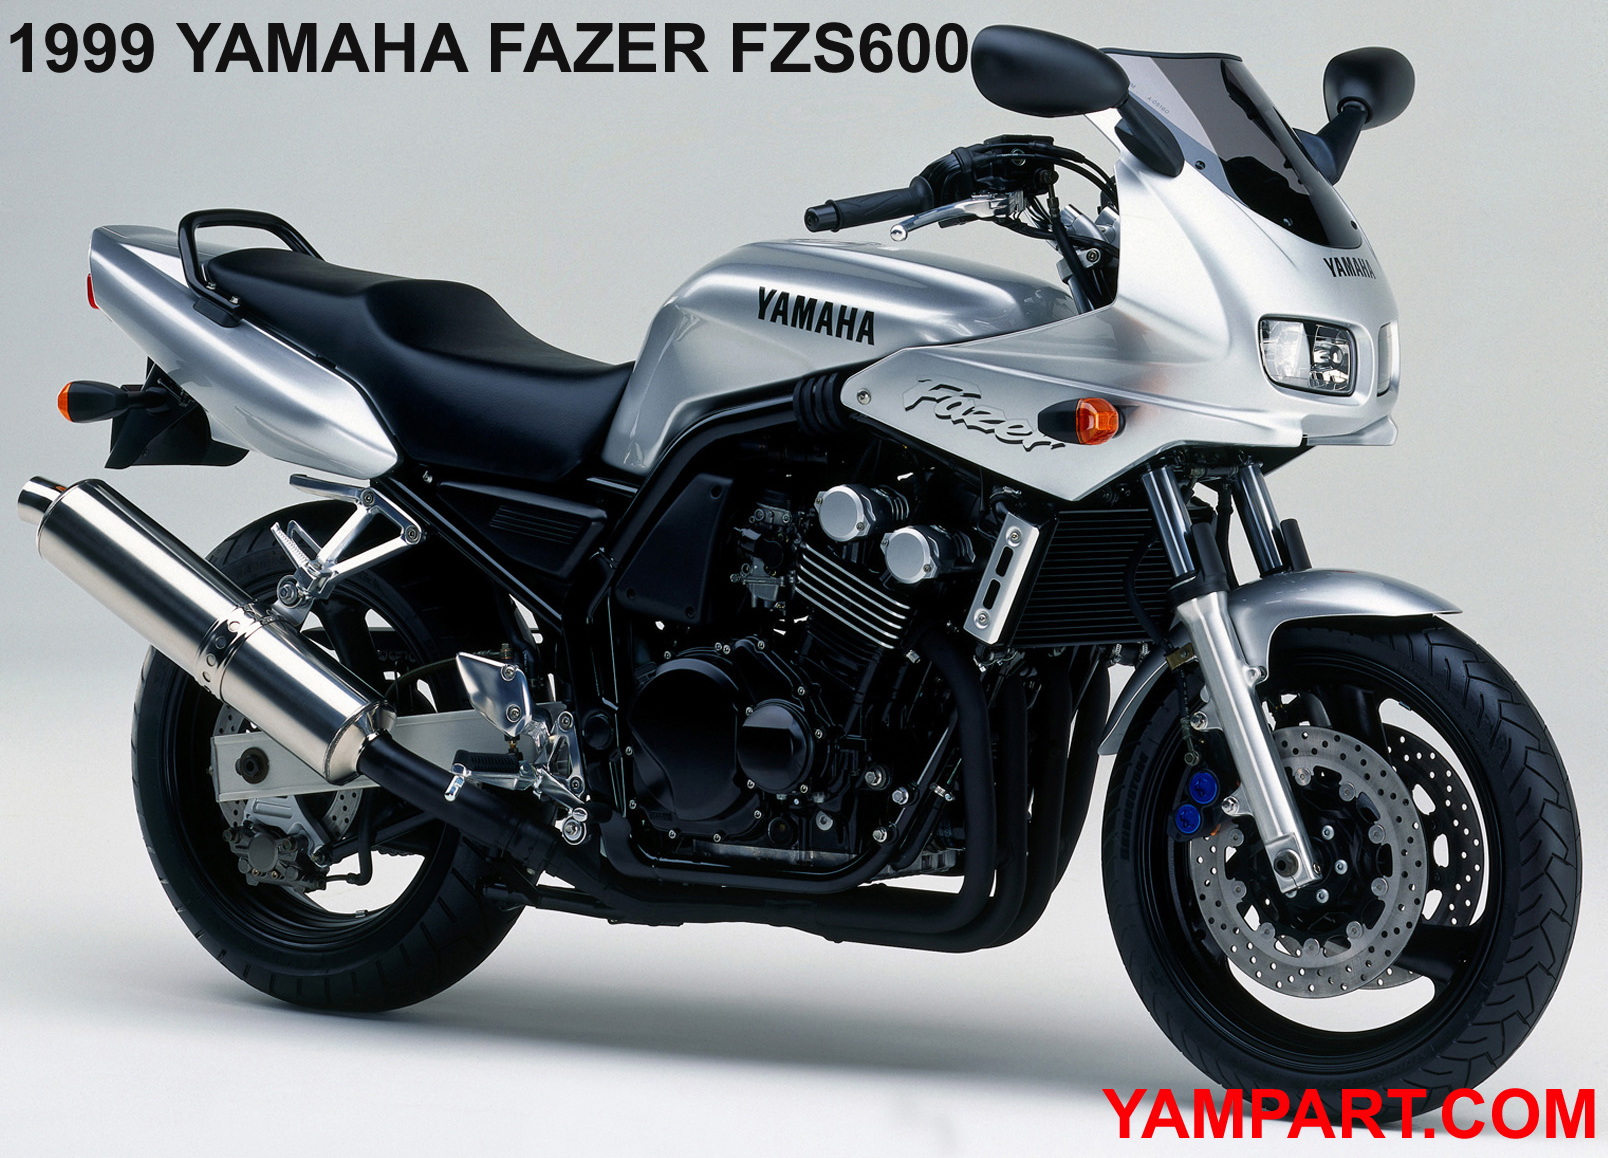 ORIGINAL 1999 SILVER YAMAHA FAZER FZS 600 USED PARTS YAMPART.COM